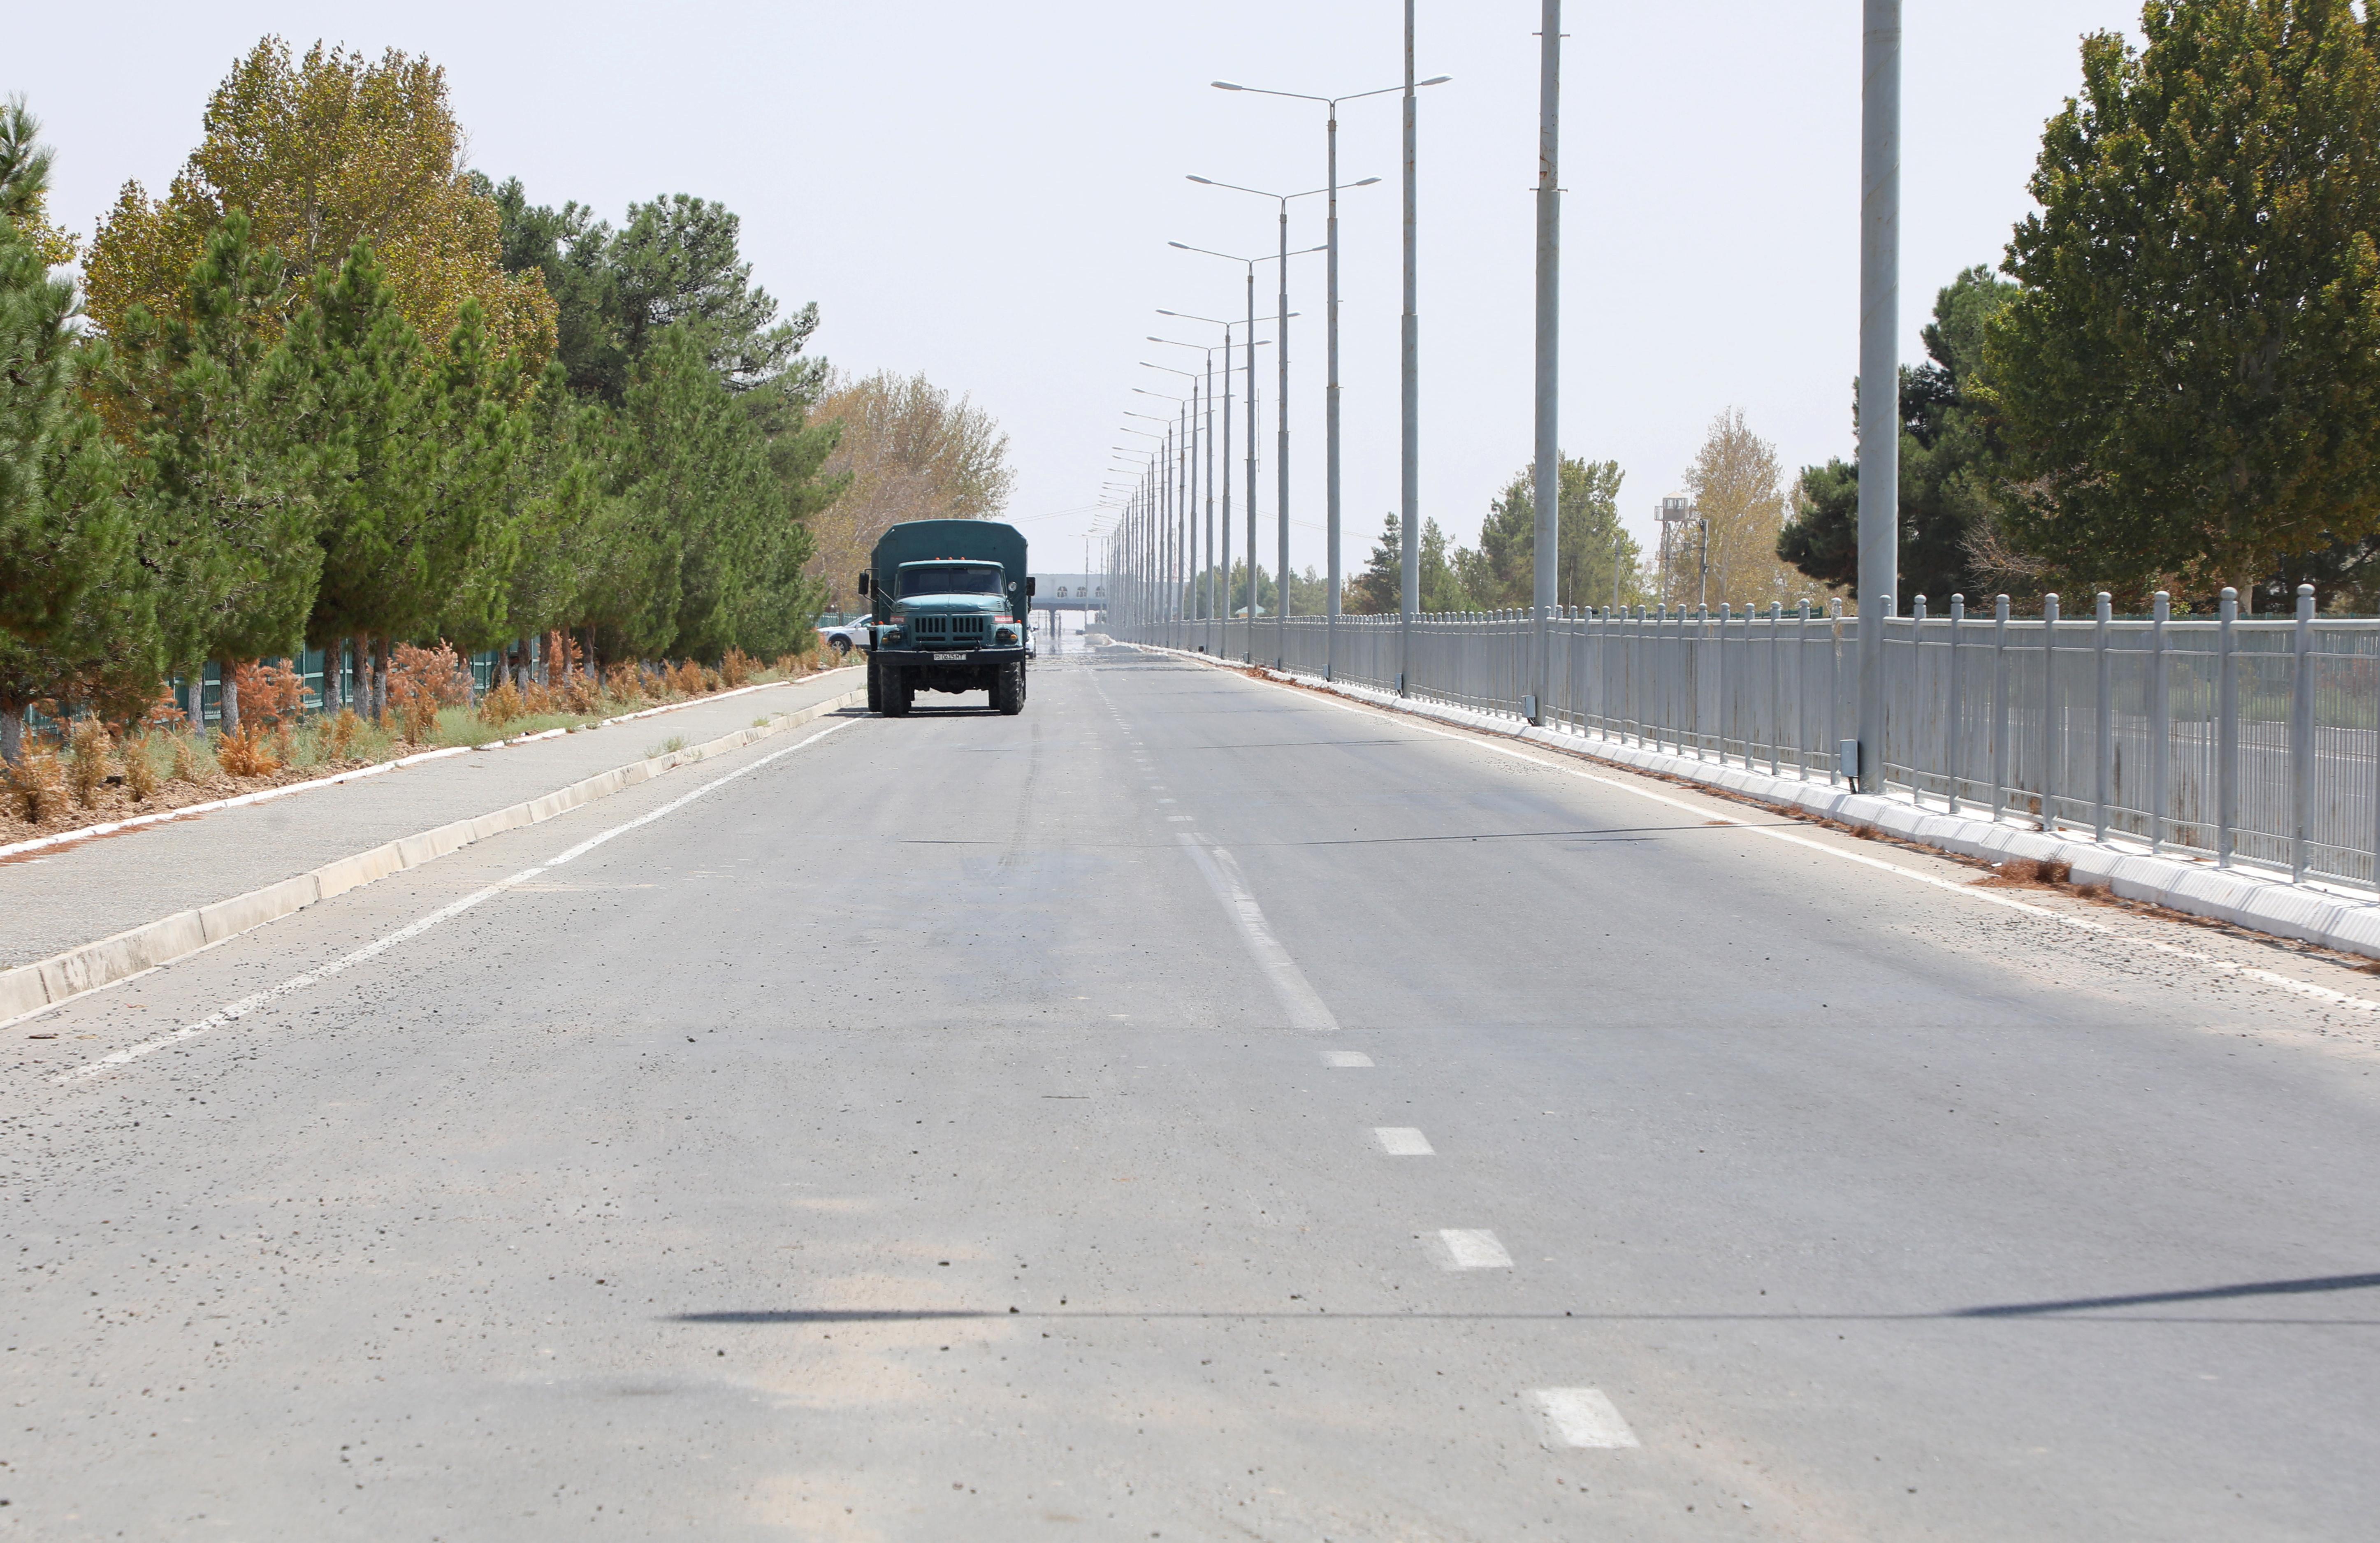 A vehicle drives near a checkpoint at the Uzbekistan-Afghanistan border in Ayritom, Uzbekistan August 15, 2021. REUTERS/Abror Kurbonmuratov